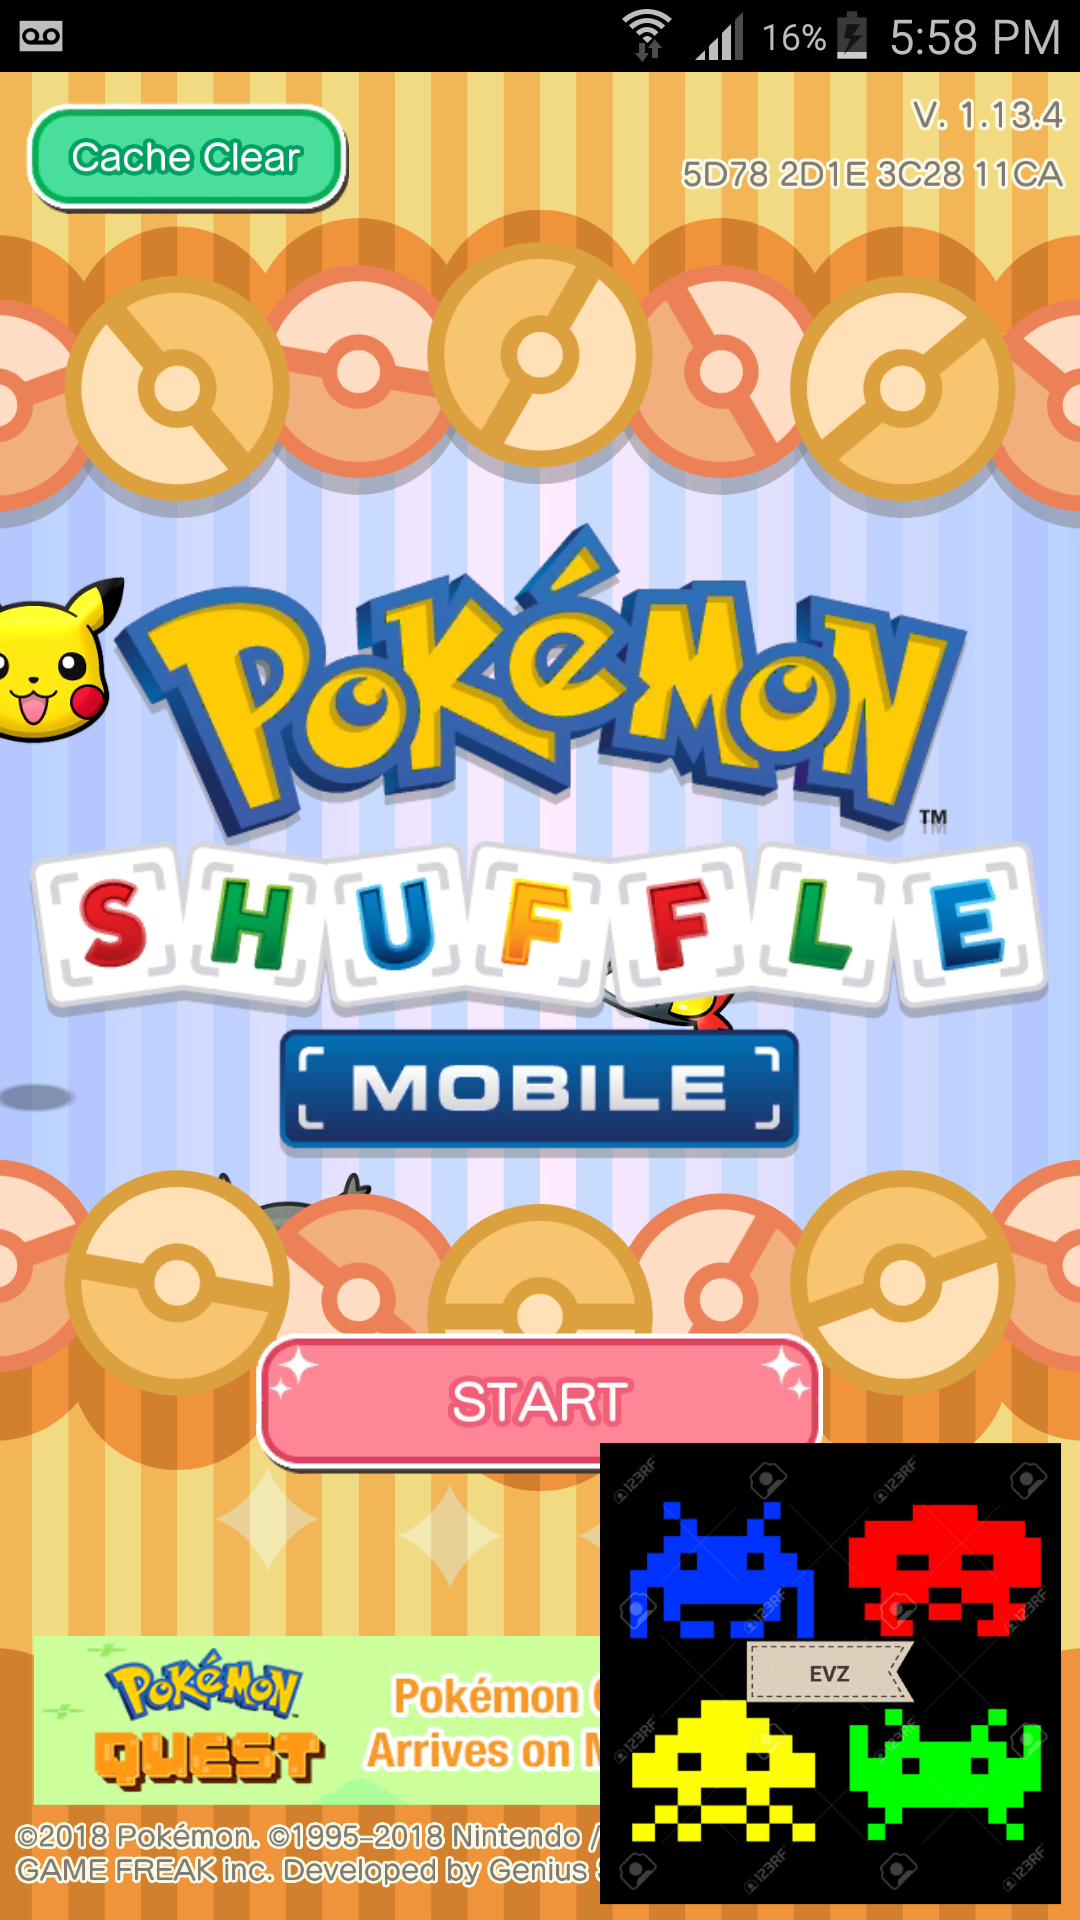 Pokemon Shuffle Mobile: Stage 015 2,910 points